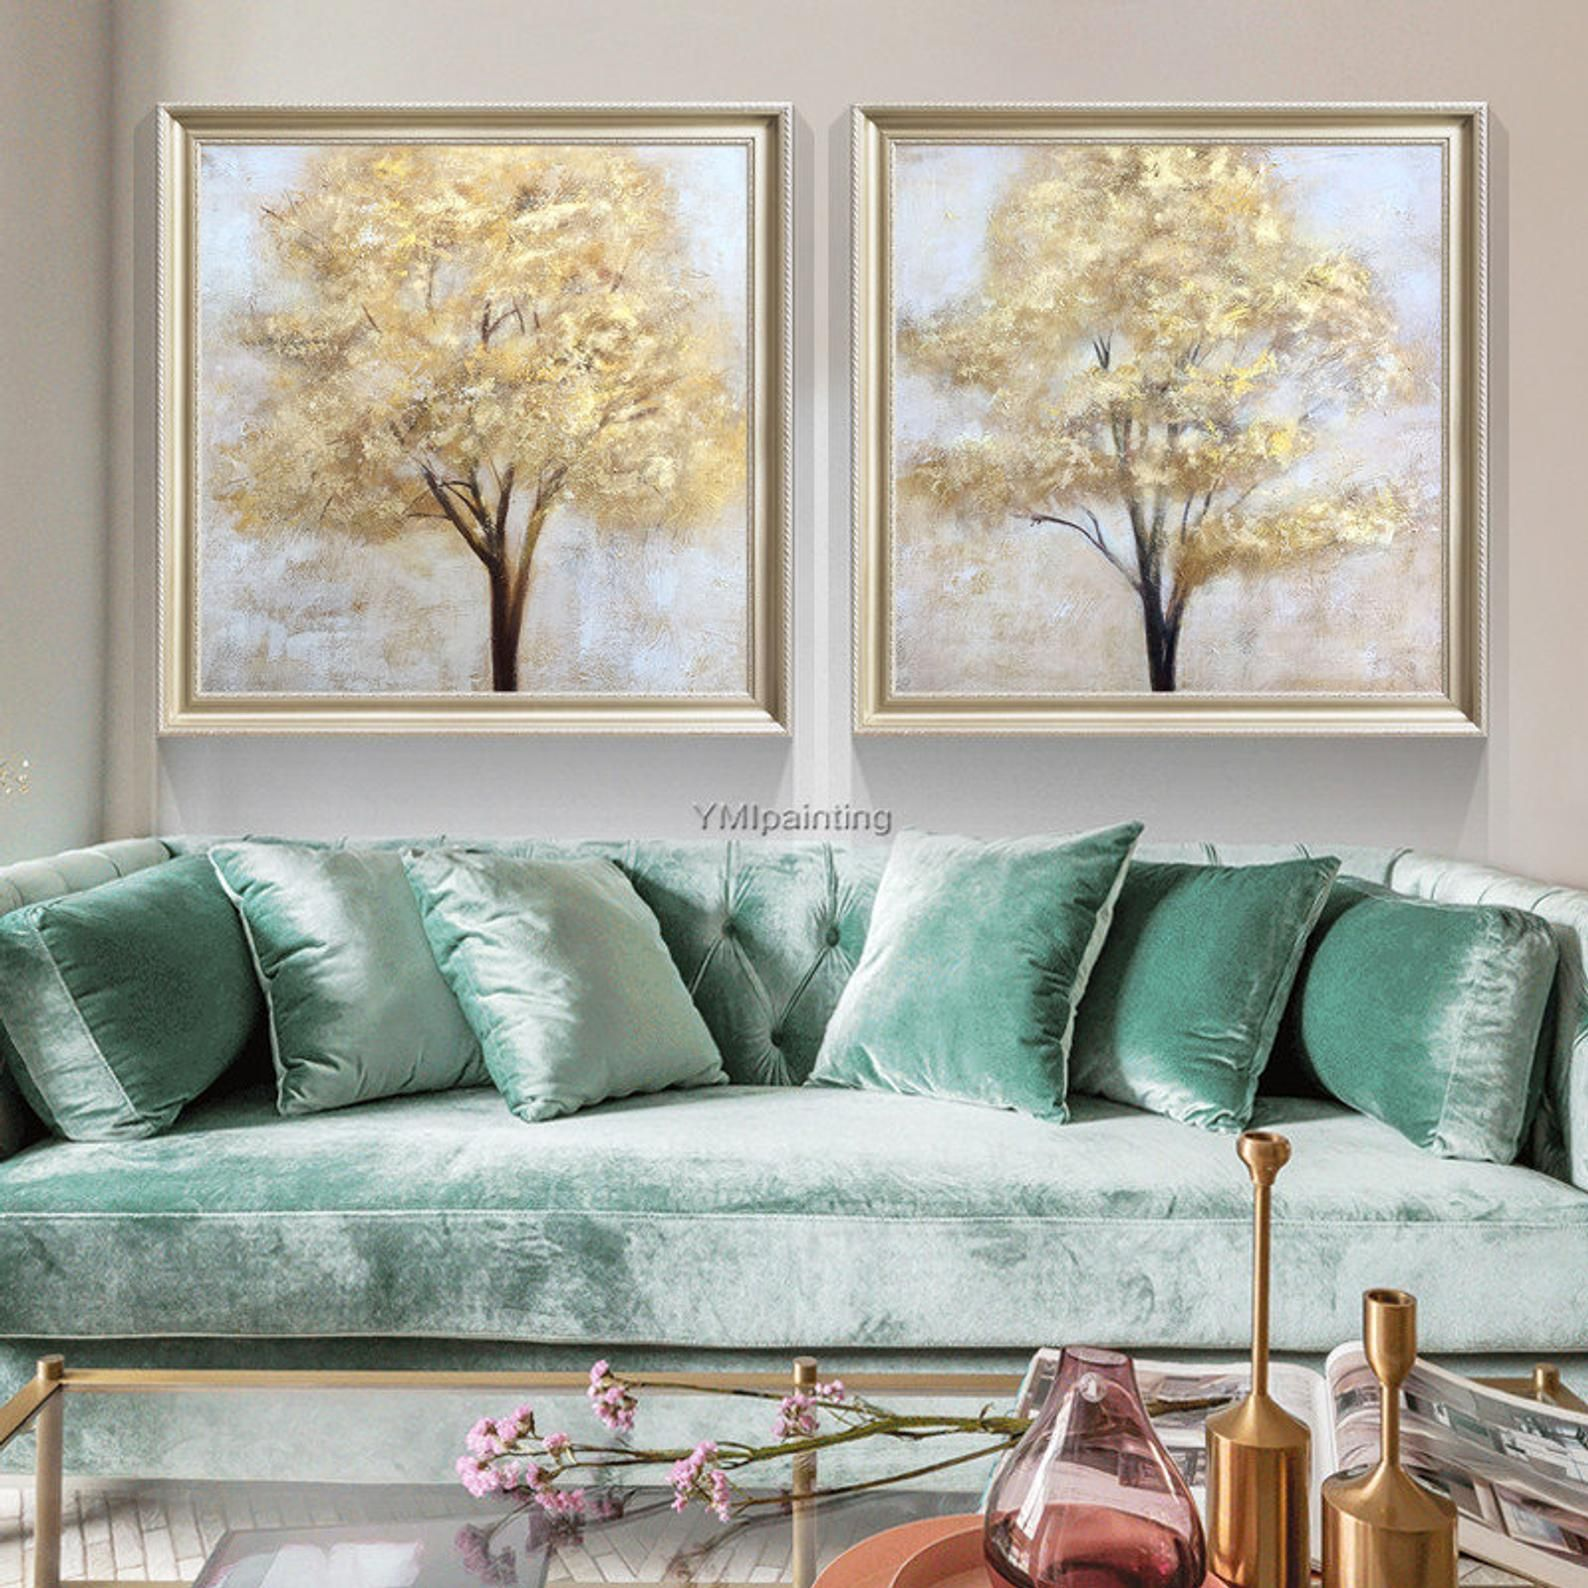 Gold Baum Des Lebens Acryl Gemalde Modern Auf Leinwand Grosse Original Textur Wand Kunst Bilder Fur Wohnzimmer Caudro En 2020 Lienzo Grande Pintura De Arbol Abstracto Fotos De Salon